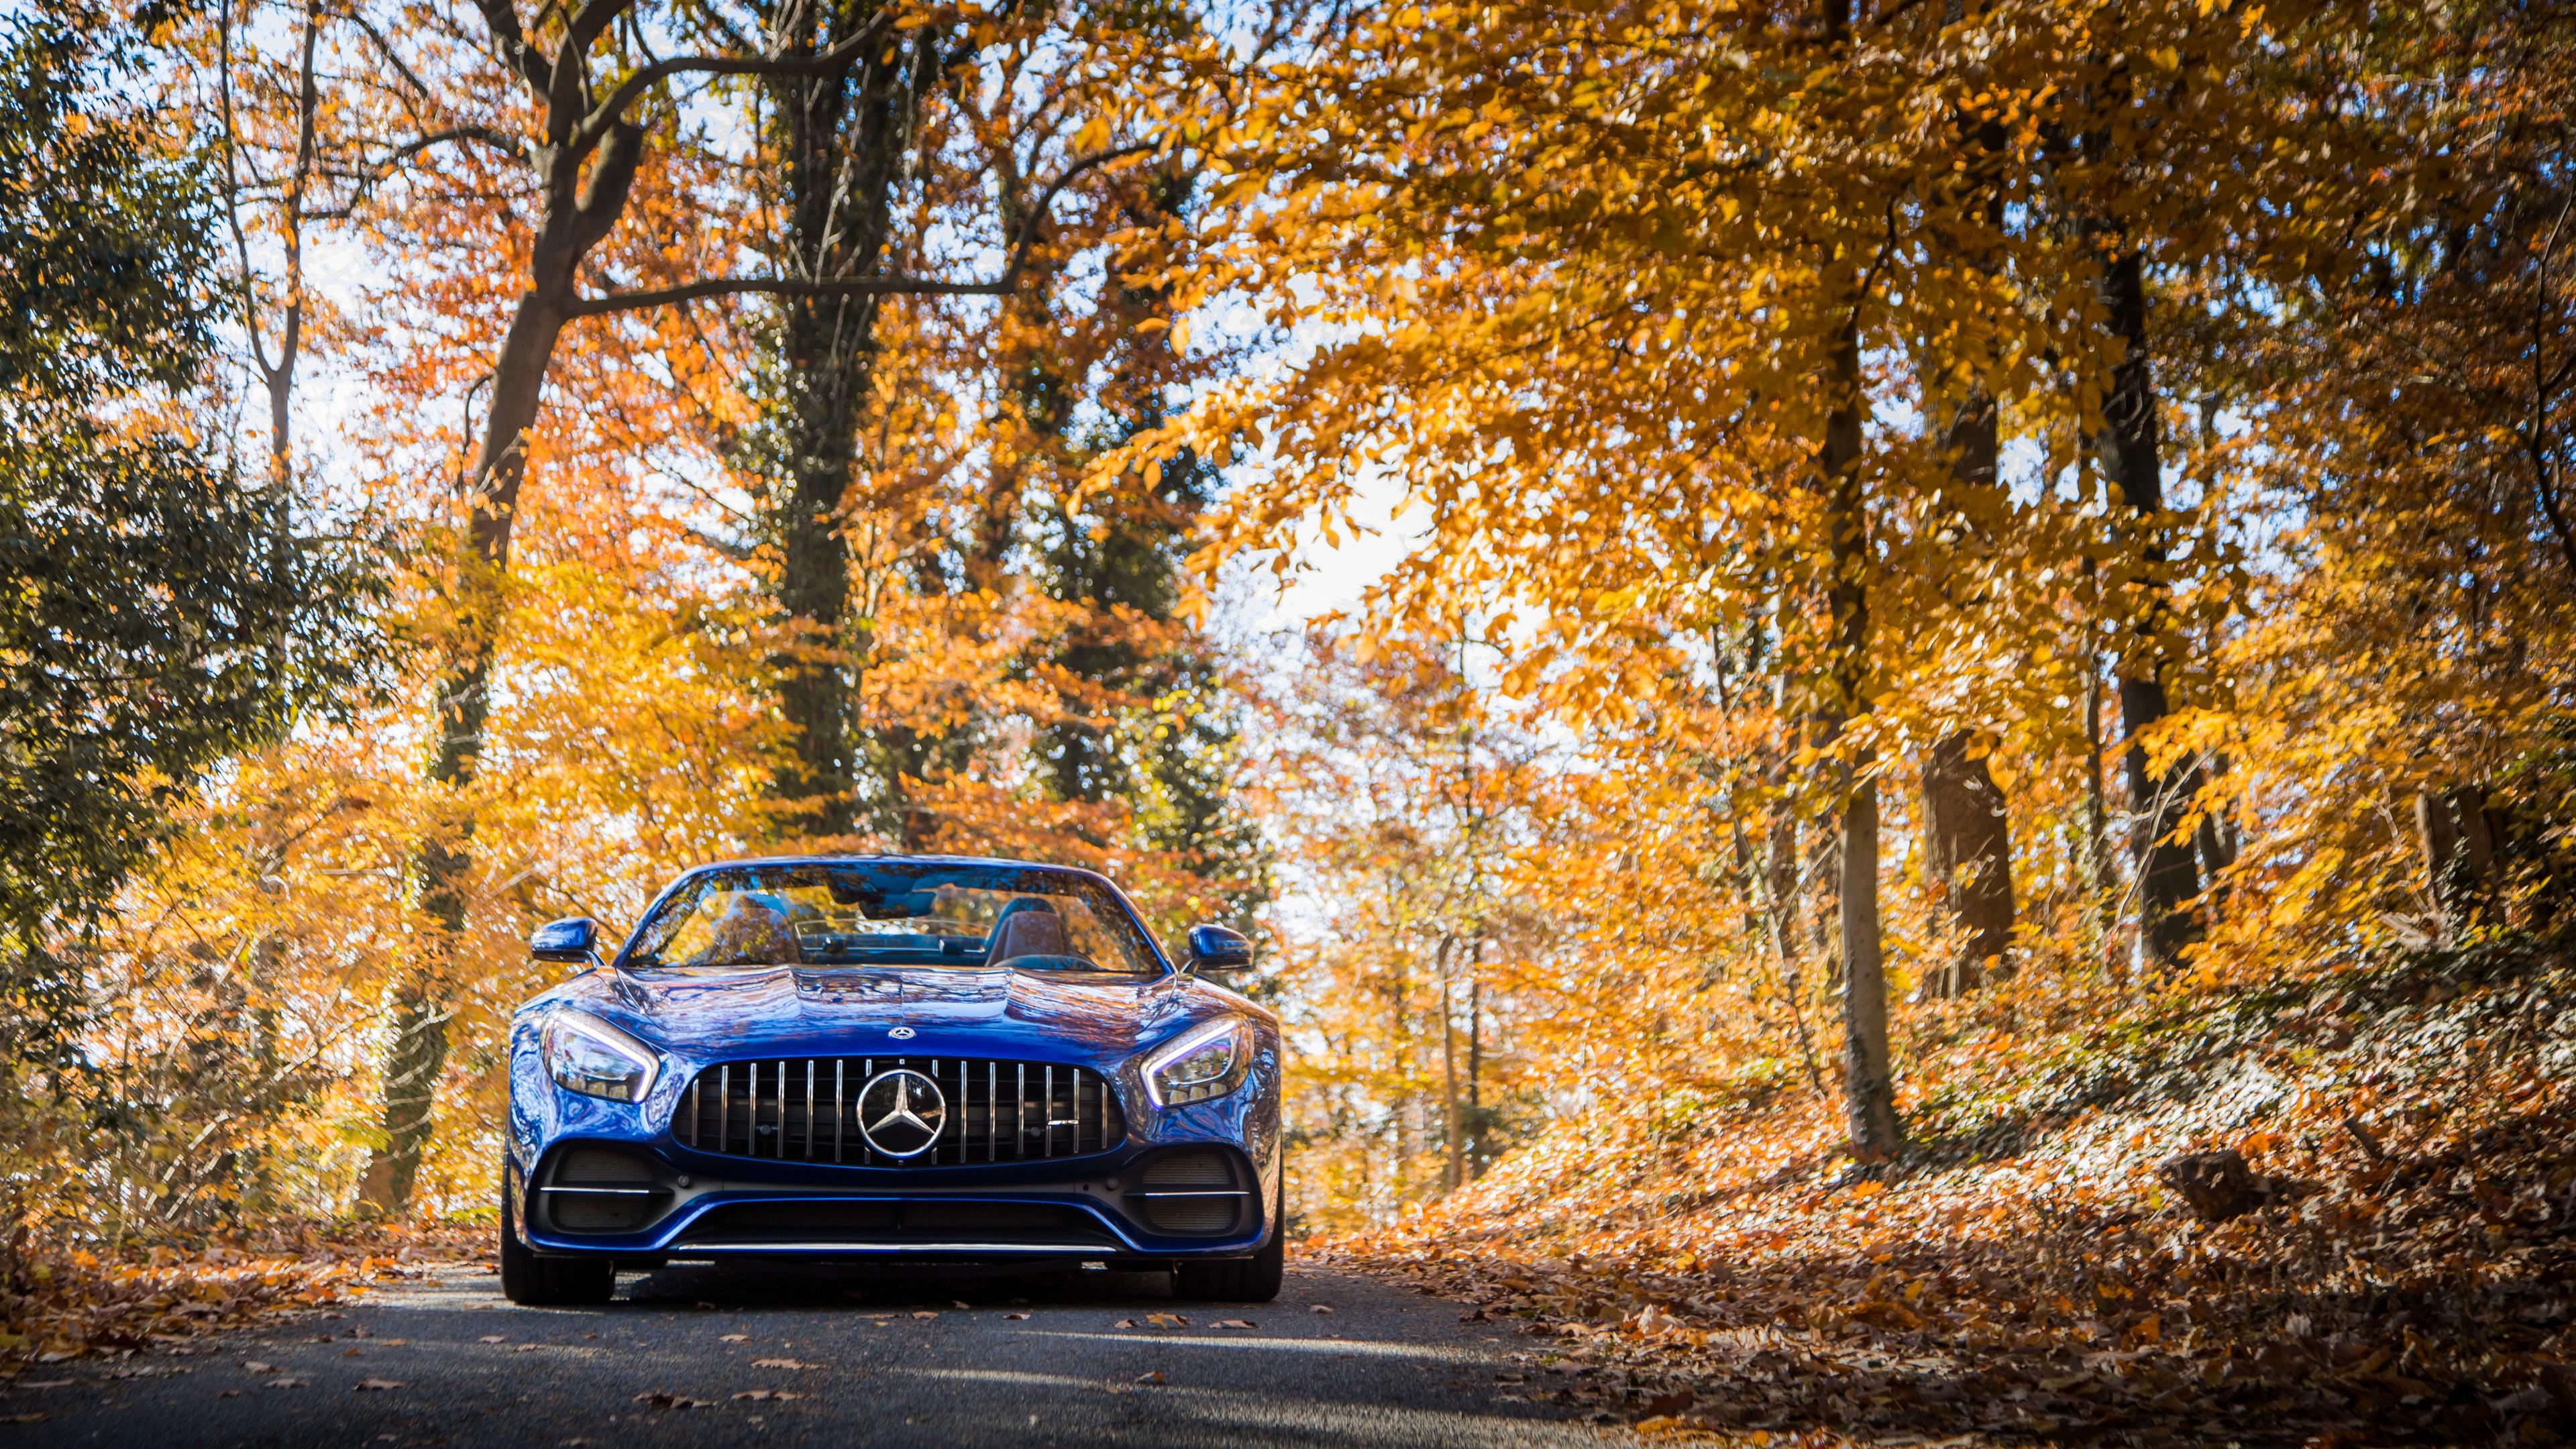 mercedes amg gt c roadster 2018 1539108677 - Mercedes AMG GT C Roadster 2018 - mercedes wallpapers, mercedes amg wallpapers, hd-wallpapers, 4k-wallpapers, 2018 cars wallpapers